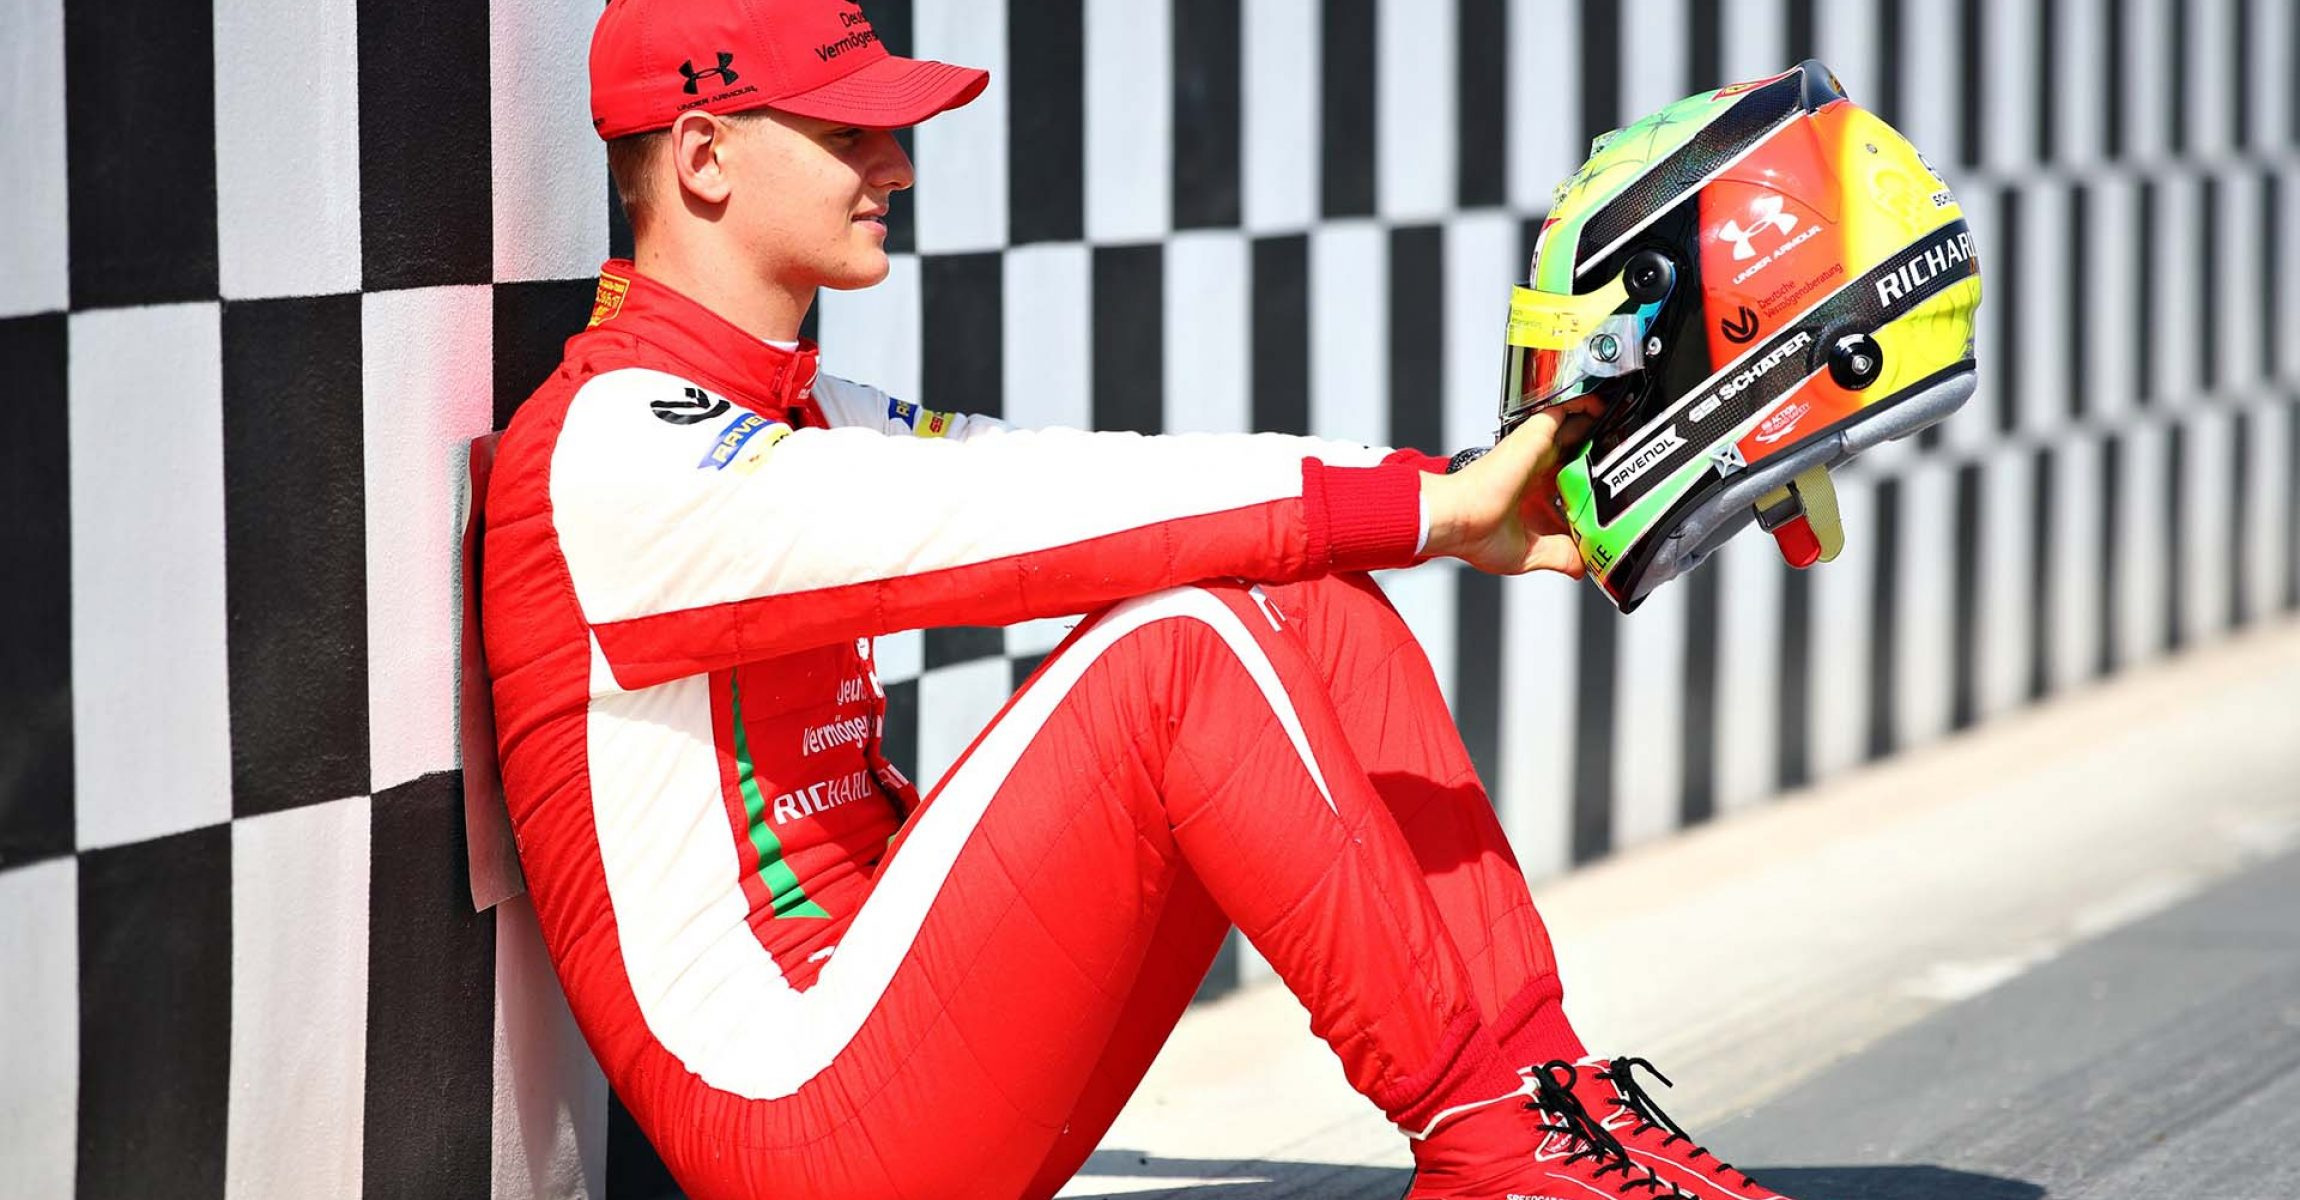 BAHRAIN, BAHRAIN - NOVEMBER 26: <> during previews ahead of Round 11:Sakhir of the Formula 2 Championship at Bahrain International Circuit on November 26, 2020 in Bahrain, Bahrain. (Photo by Joe Portlock - Formula 1/Formula 1 via Getty Images)